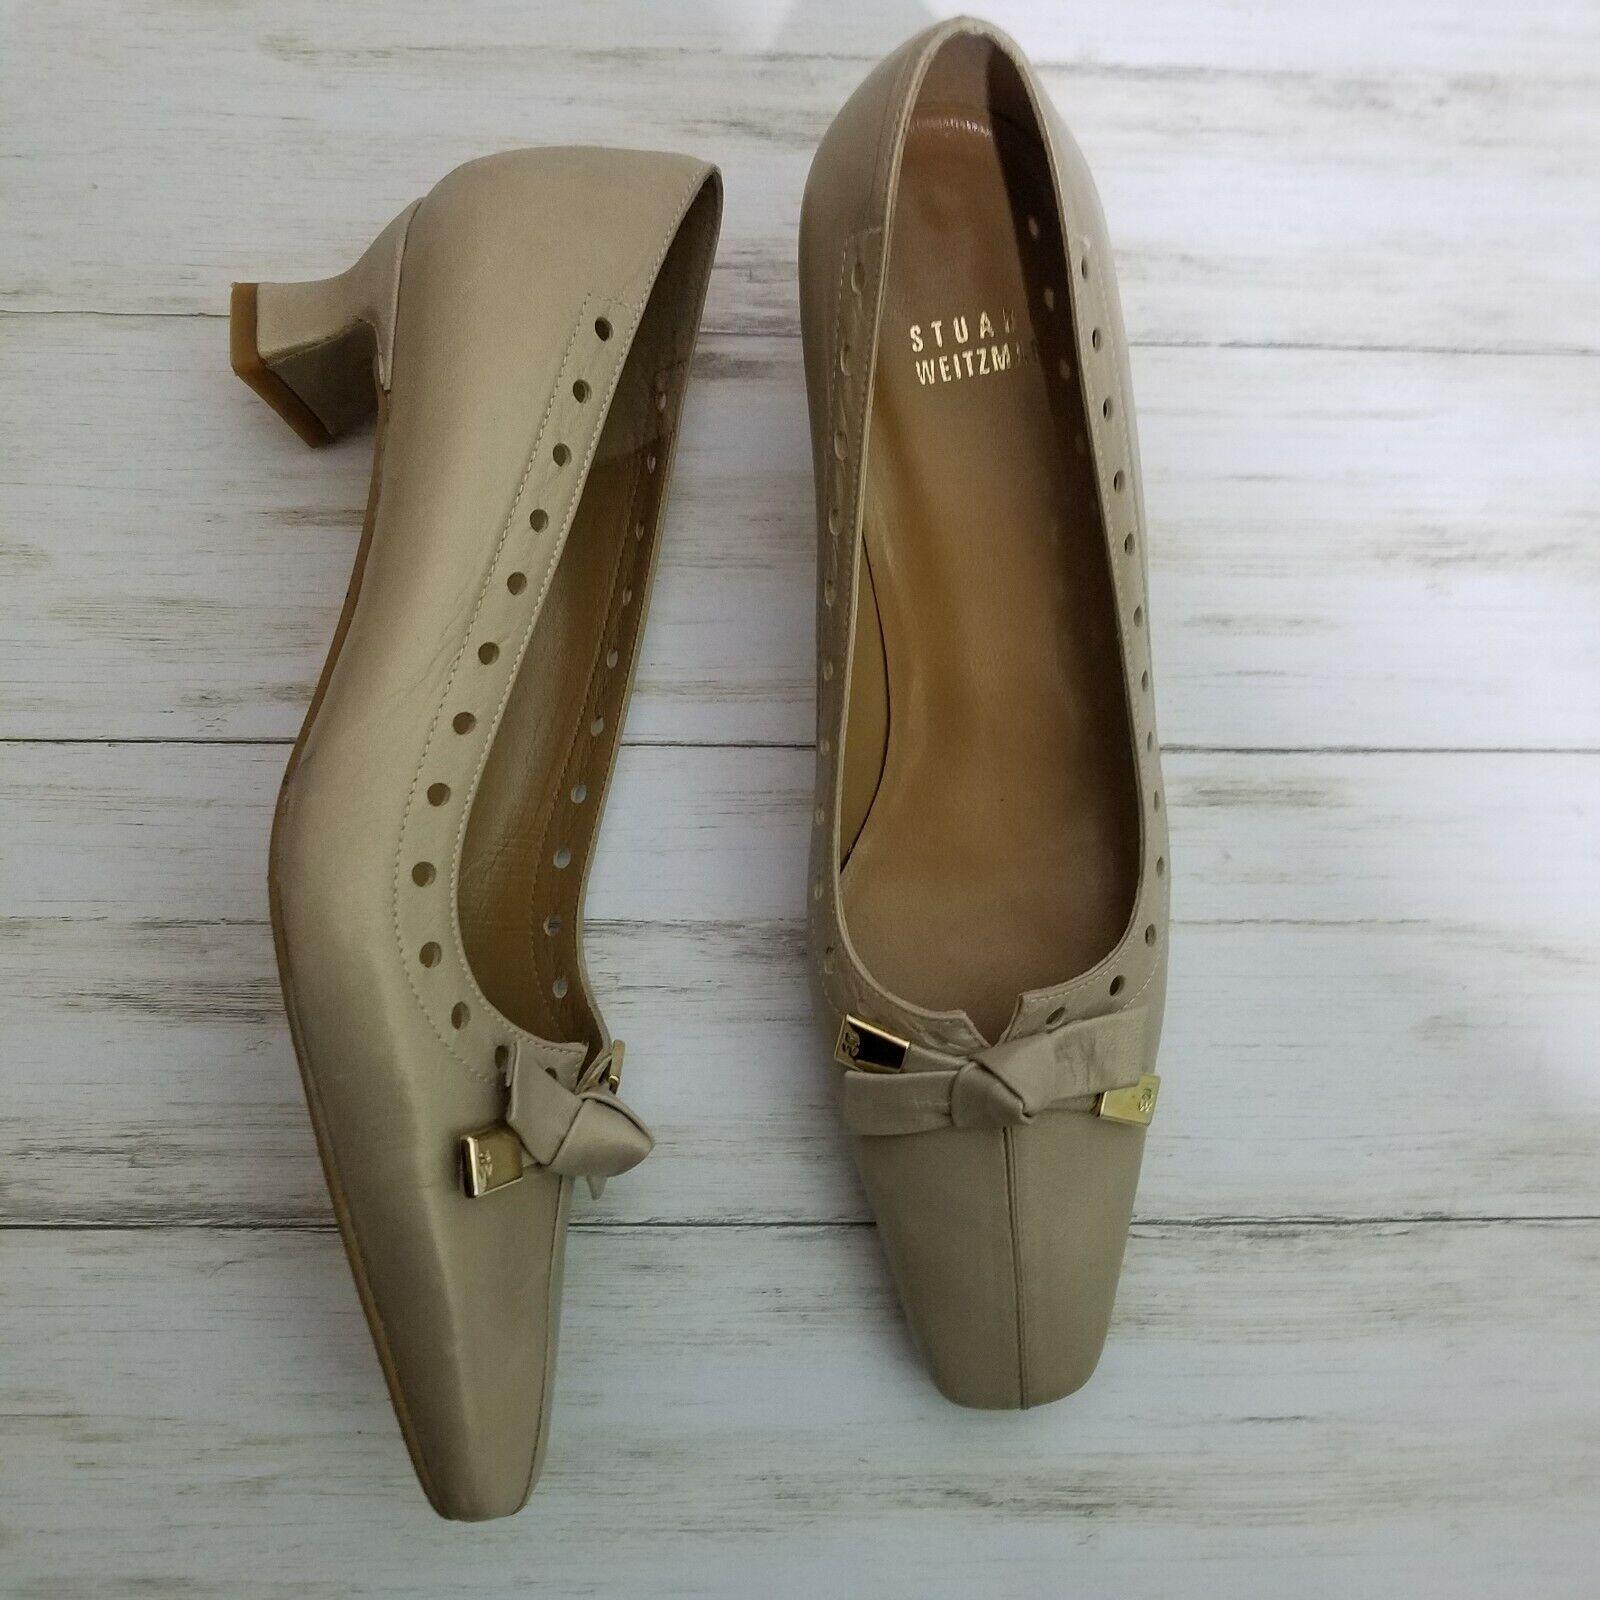 Vintage Stuart Weitzman Beige Leather Bows Perforated Edge Kitten Heels Sz 7N